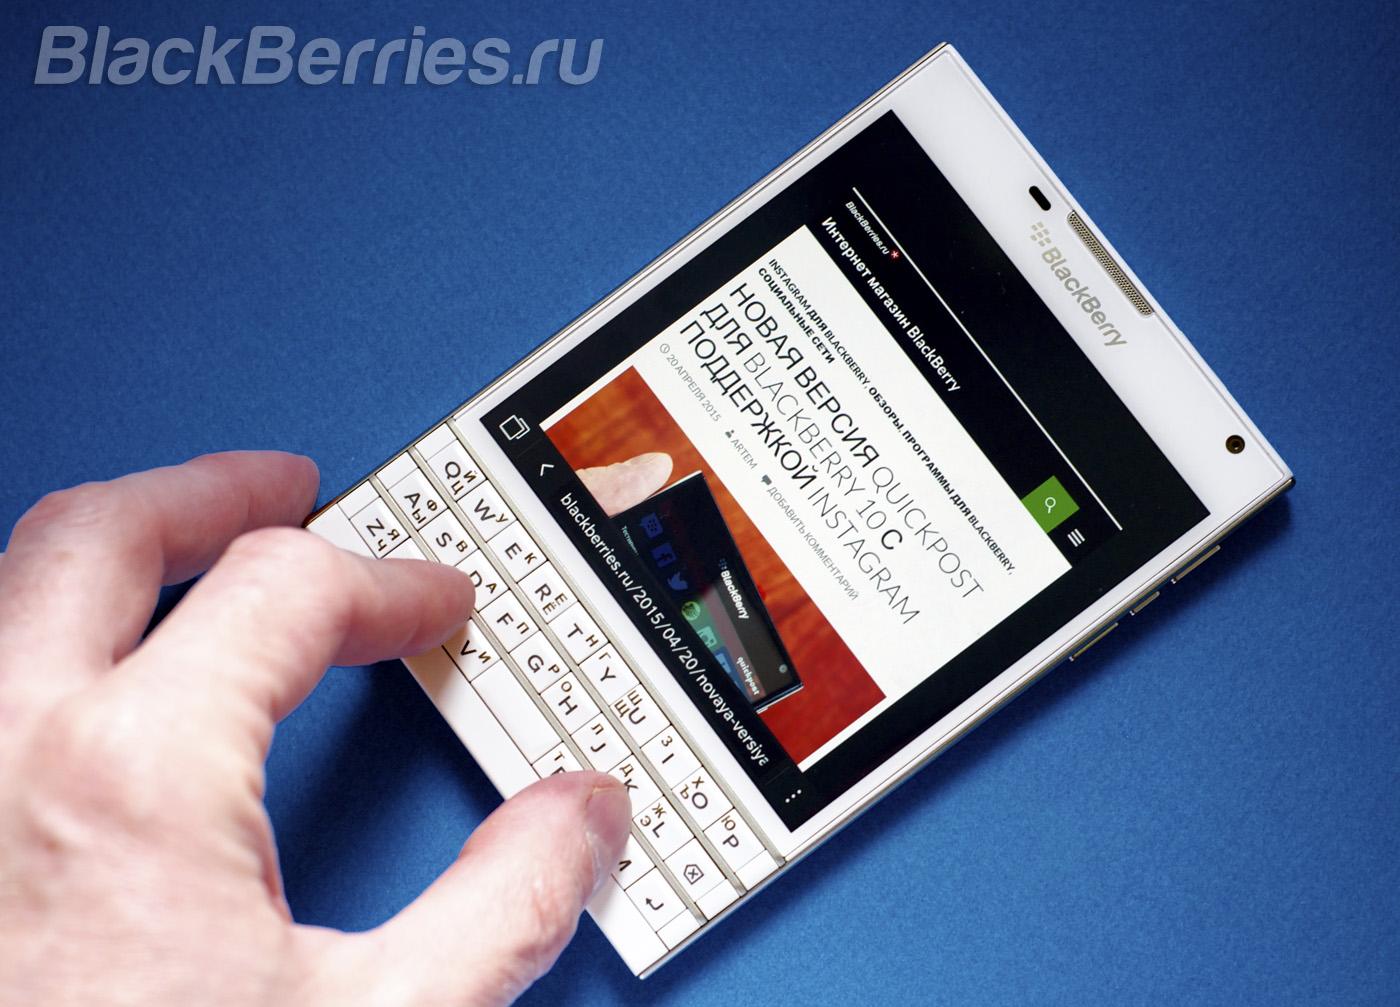 BlackBerry-Passport-10-3-2-500